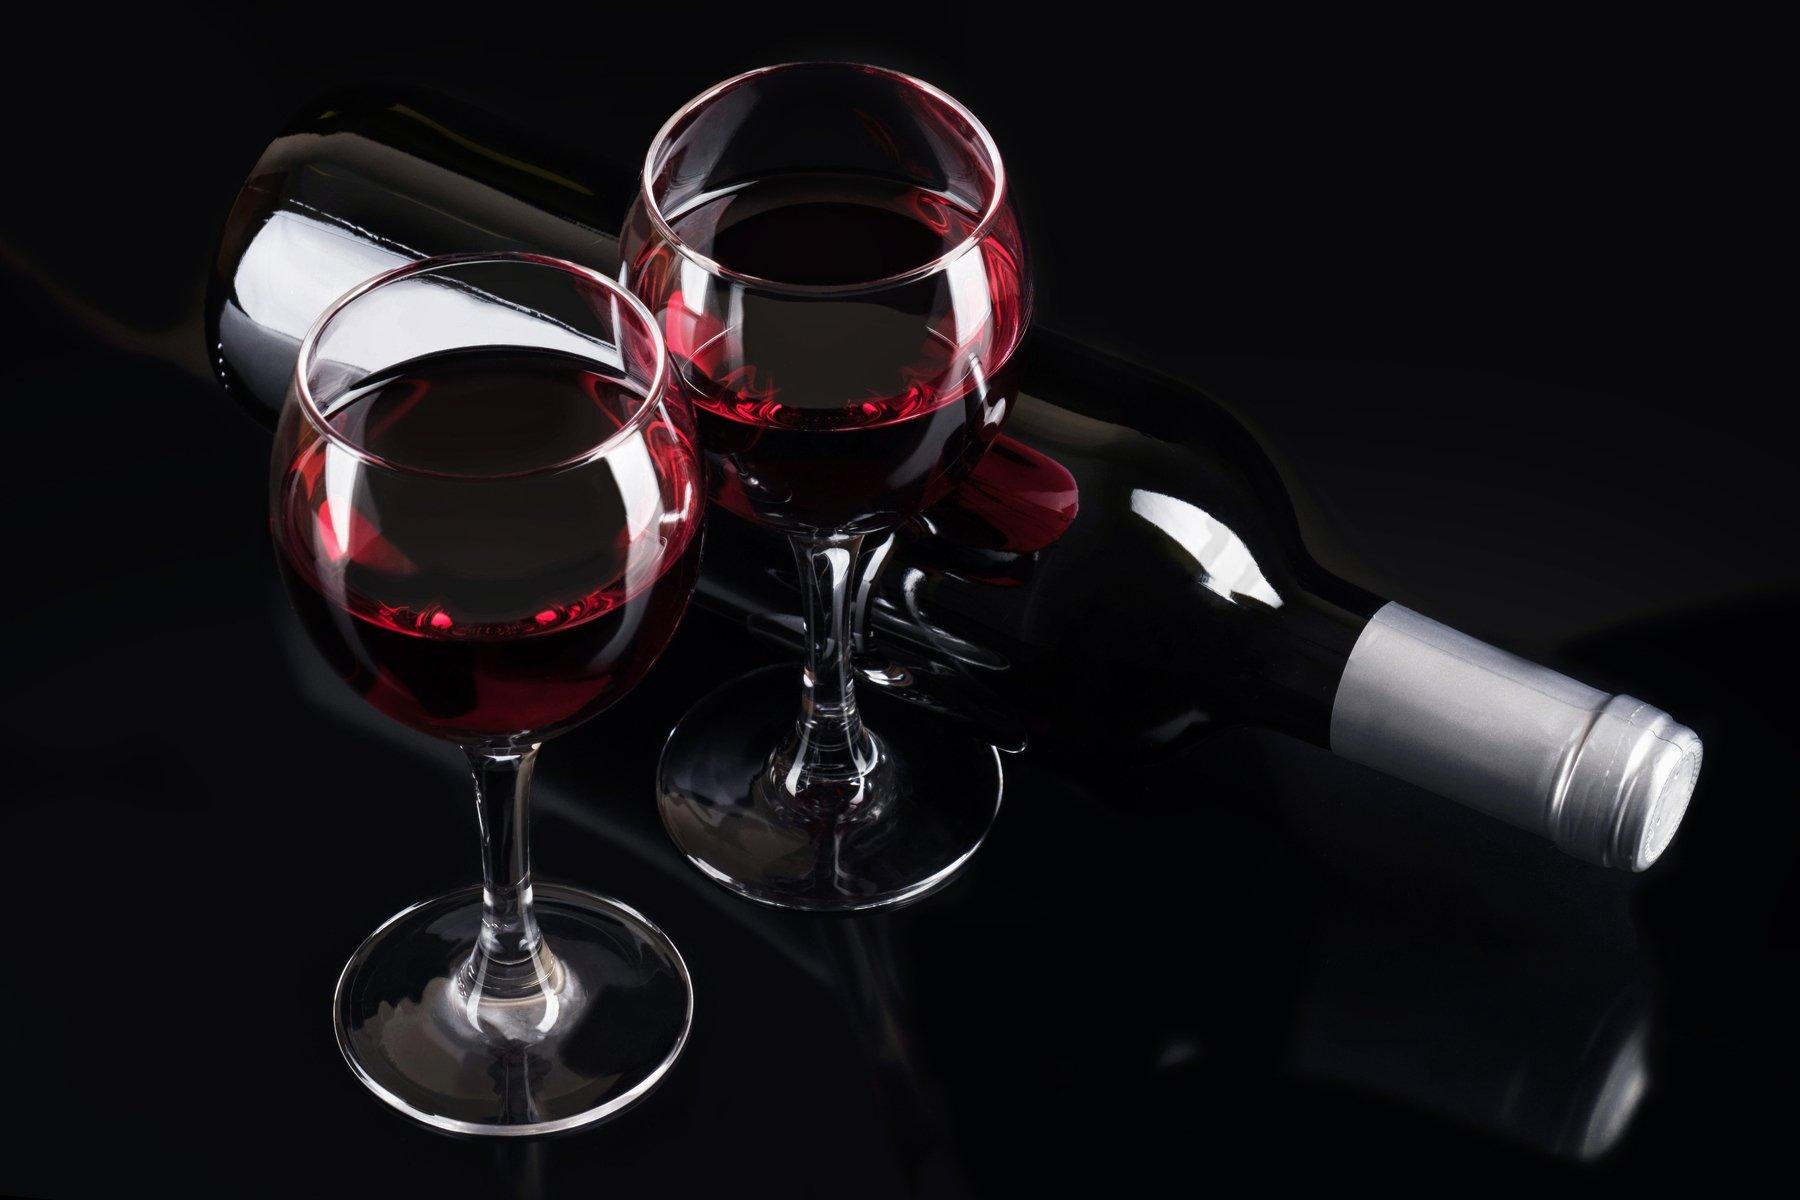 красное вино, бокалы, бутылка, черное, Оксана Клименкова